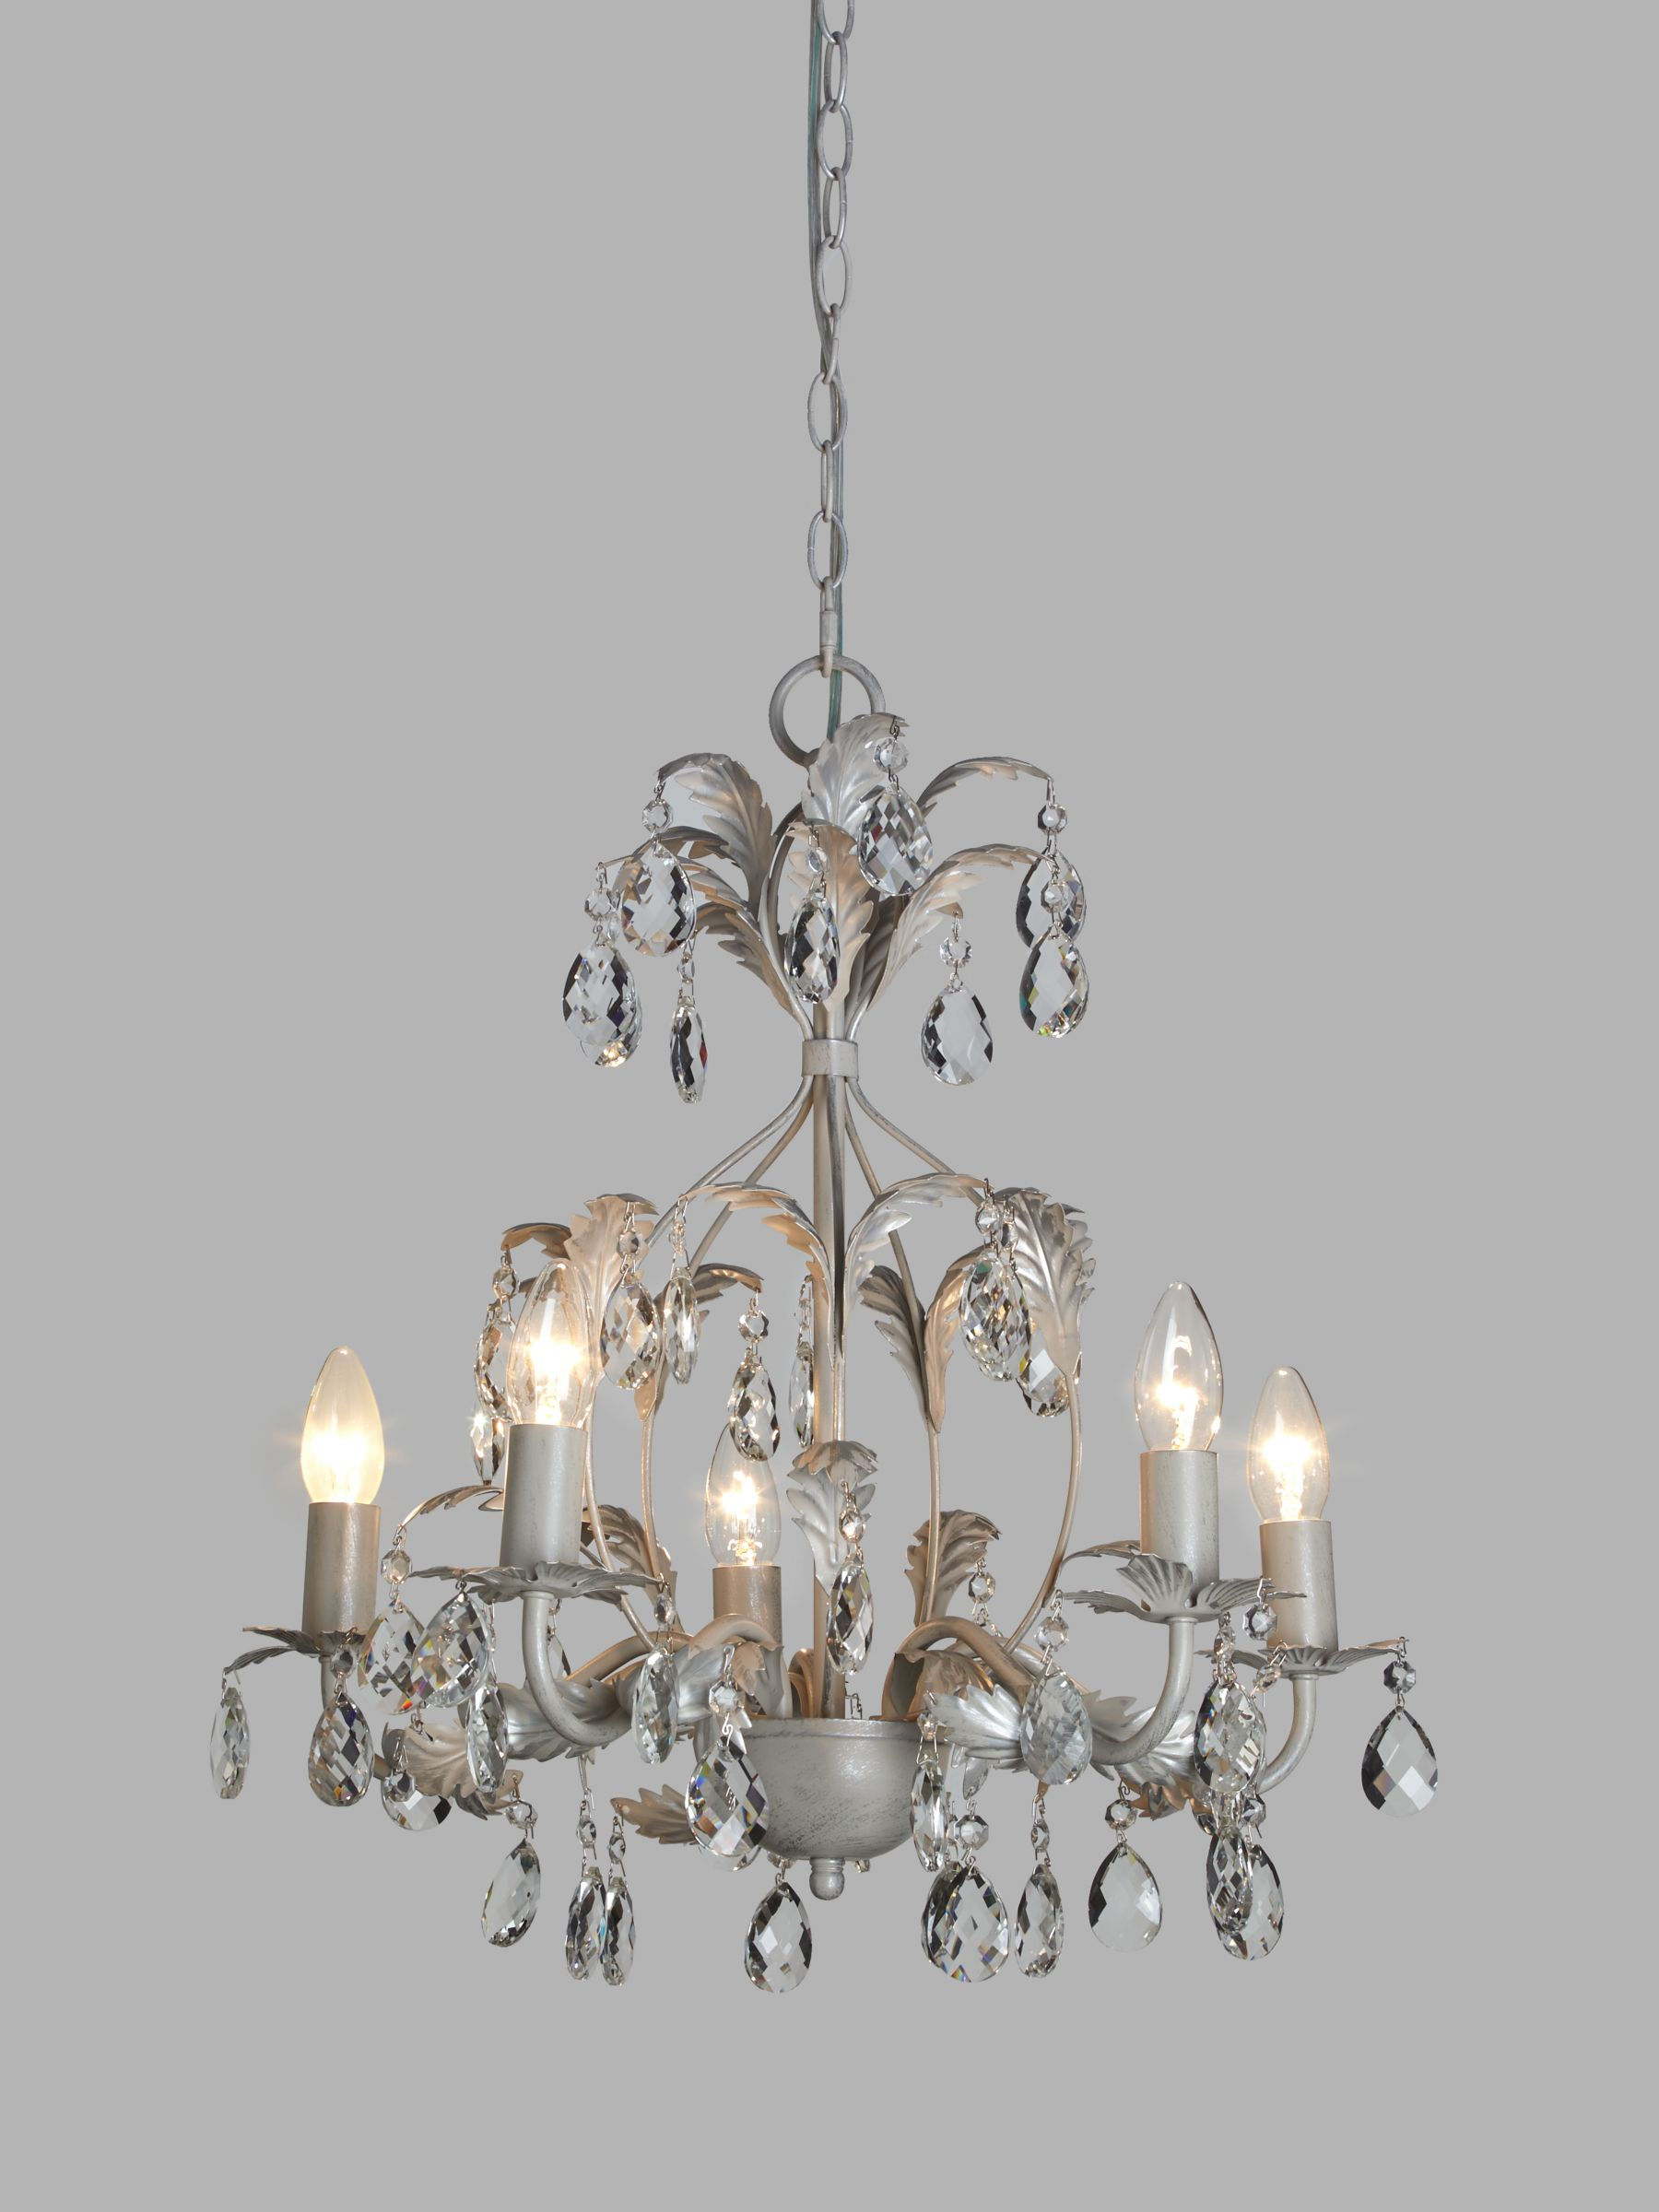 John Lewis & Partners Arbour Crystal Chandelier Ceiling Light, Cream